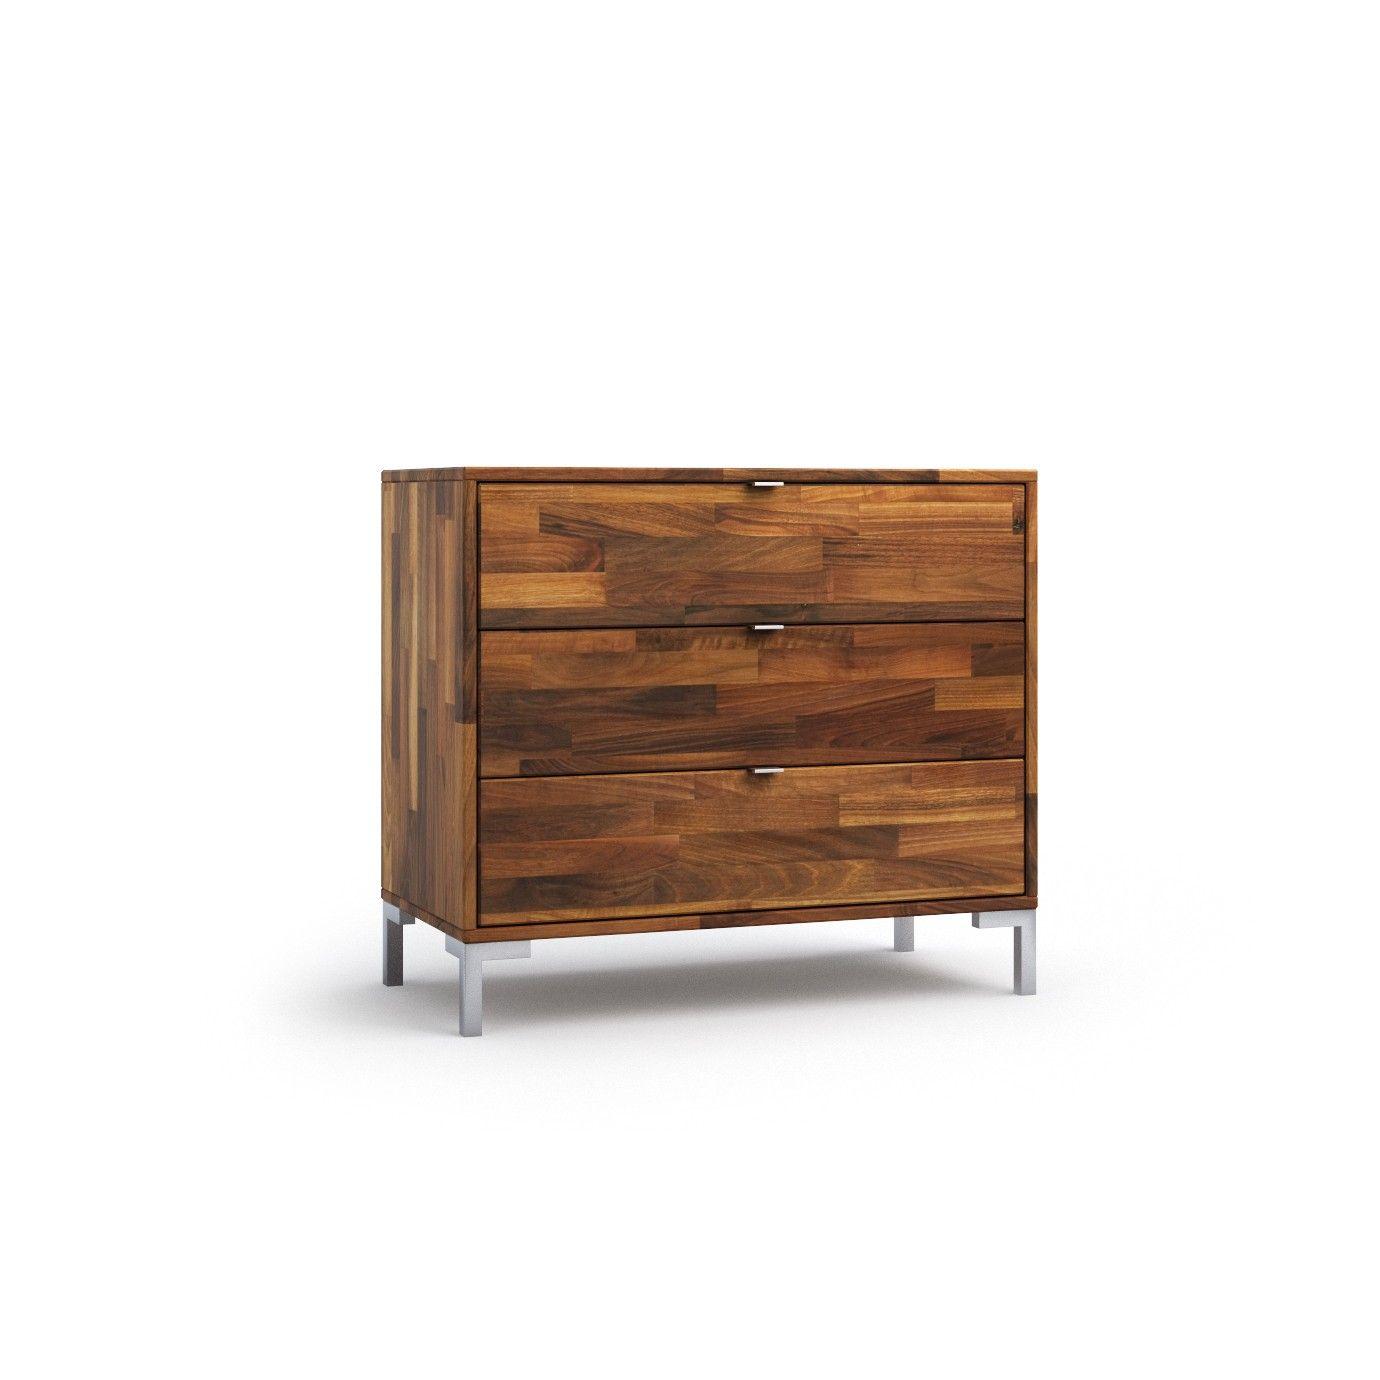 Wohnzimmer Kommoden, galea jetzt bestellen unter: https://moebel.ladendirekt.de, Design ideen